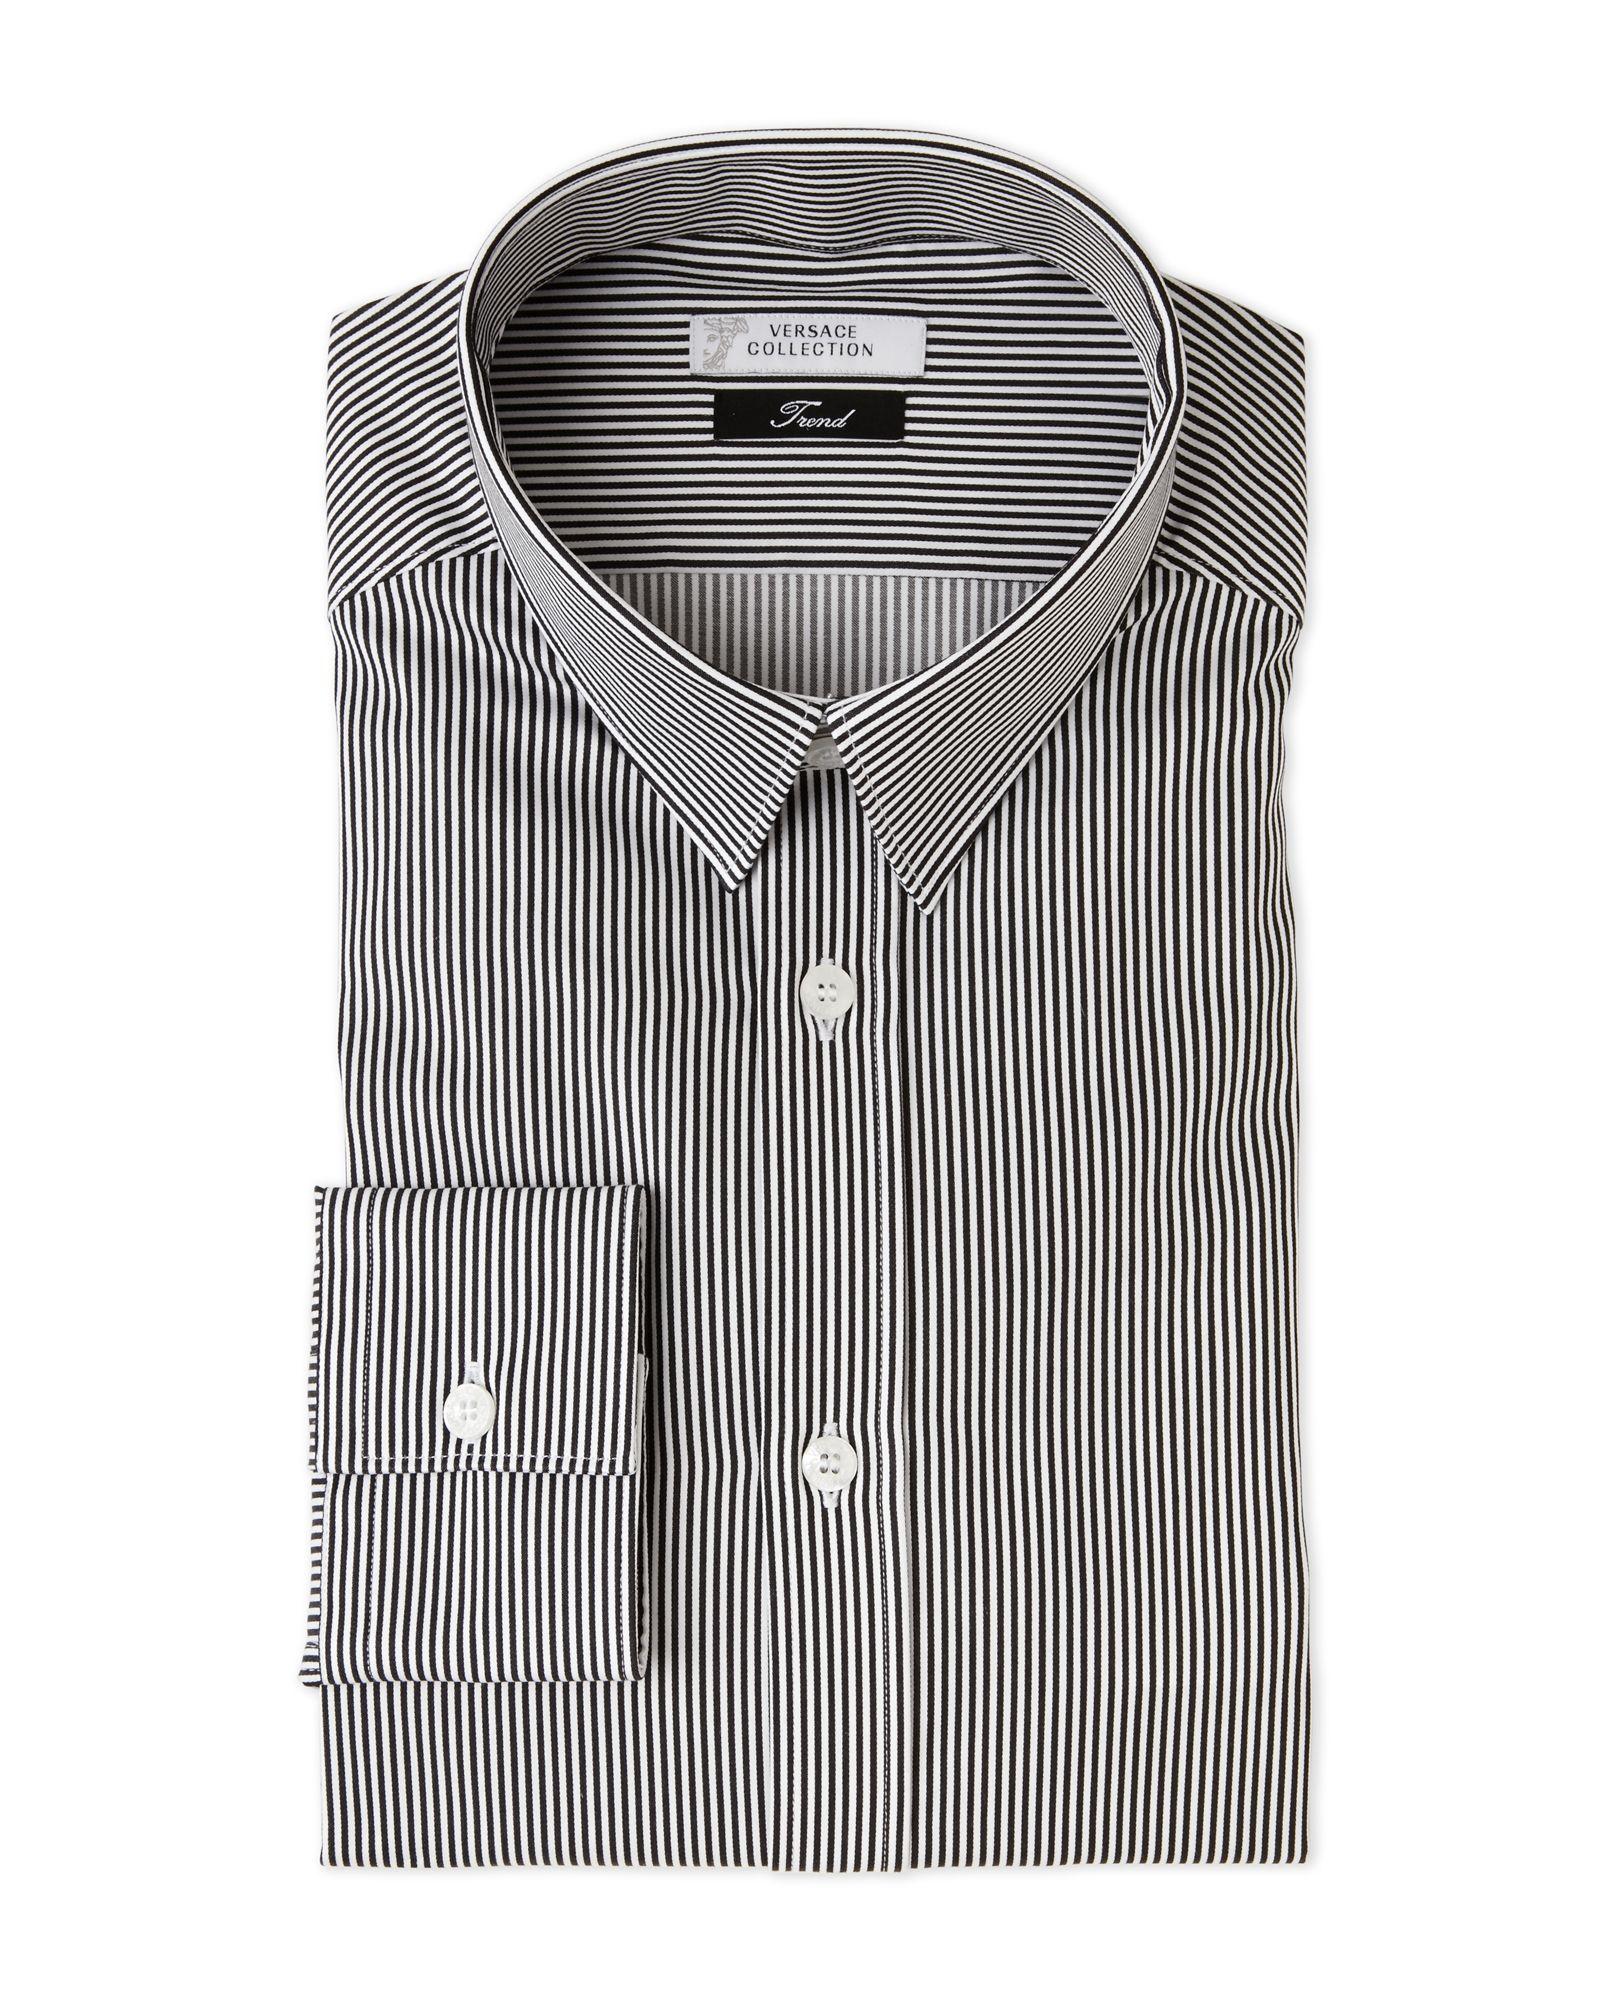 Versace Collection White   Grey Striped Trend Fit Dress Shirt Taillierte  Hemden d259ec7b2c